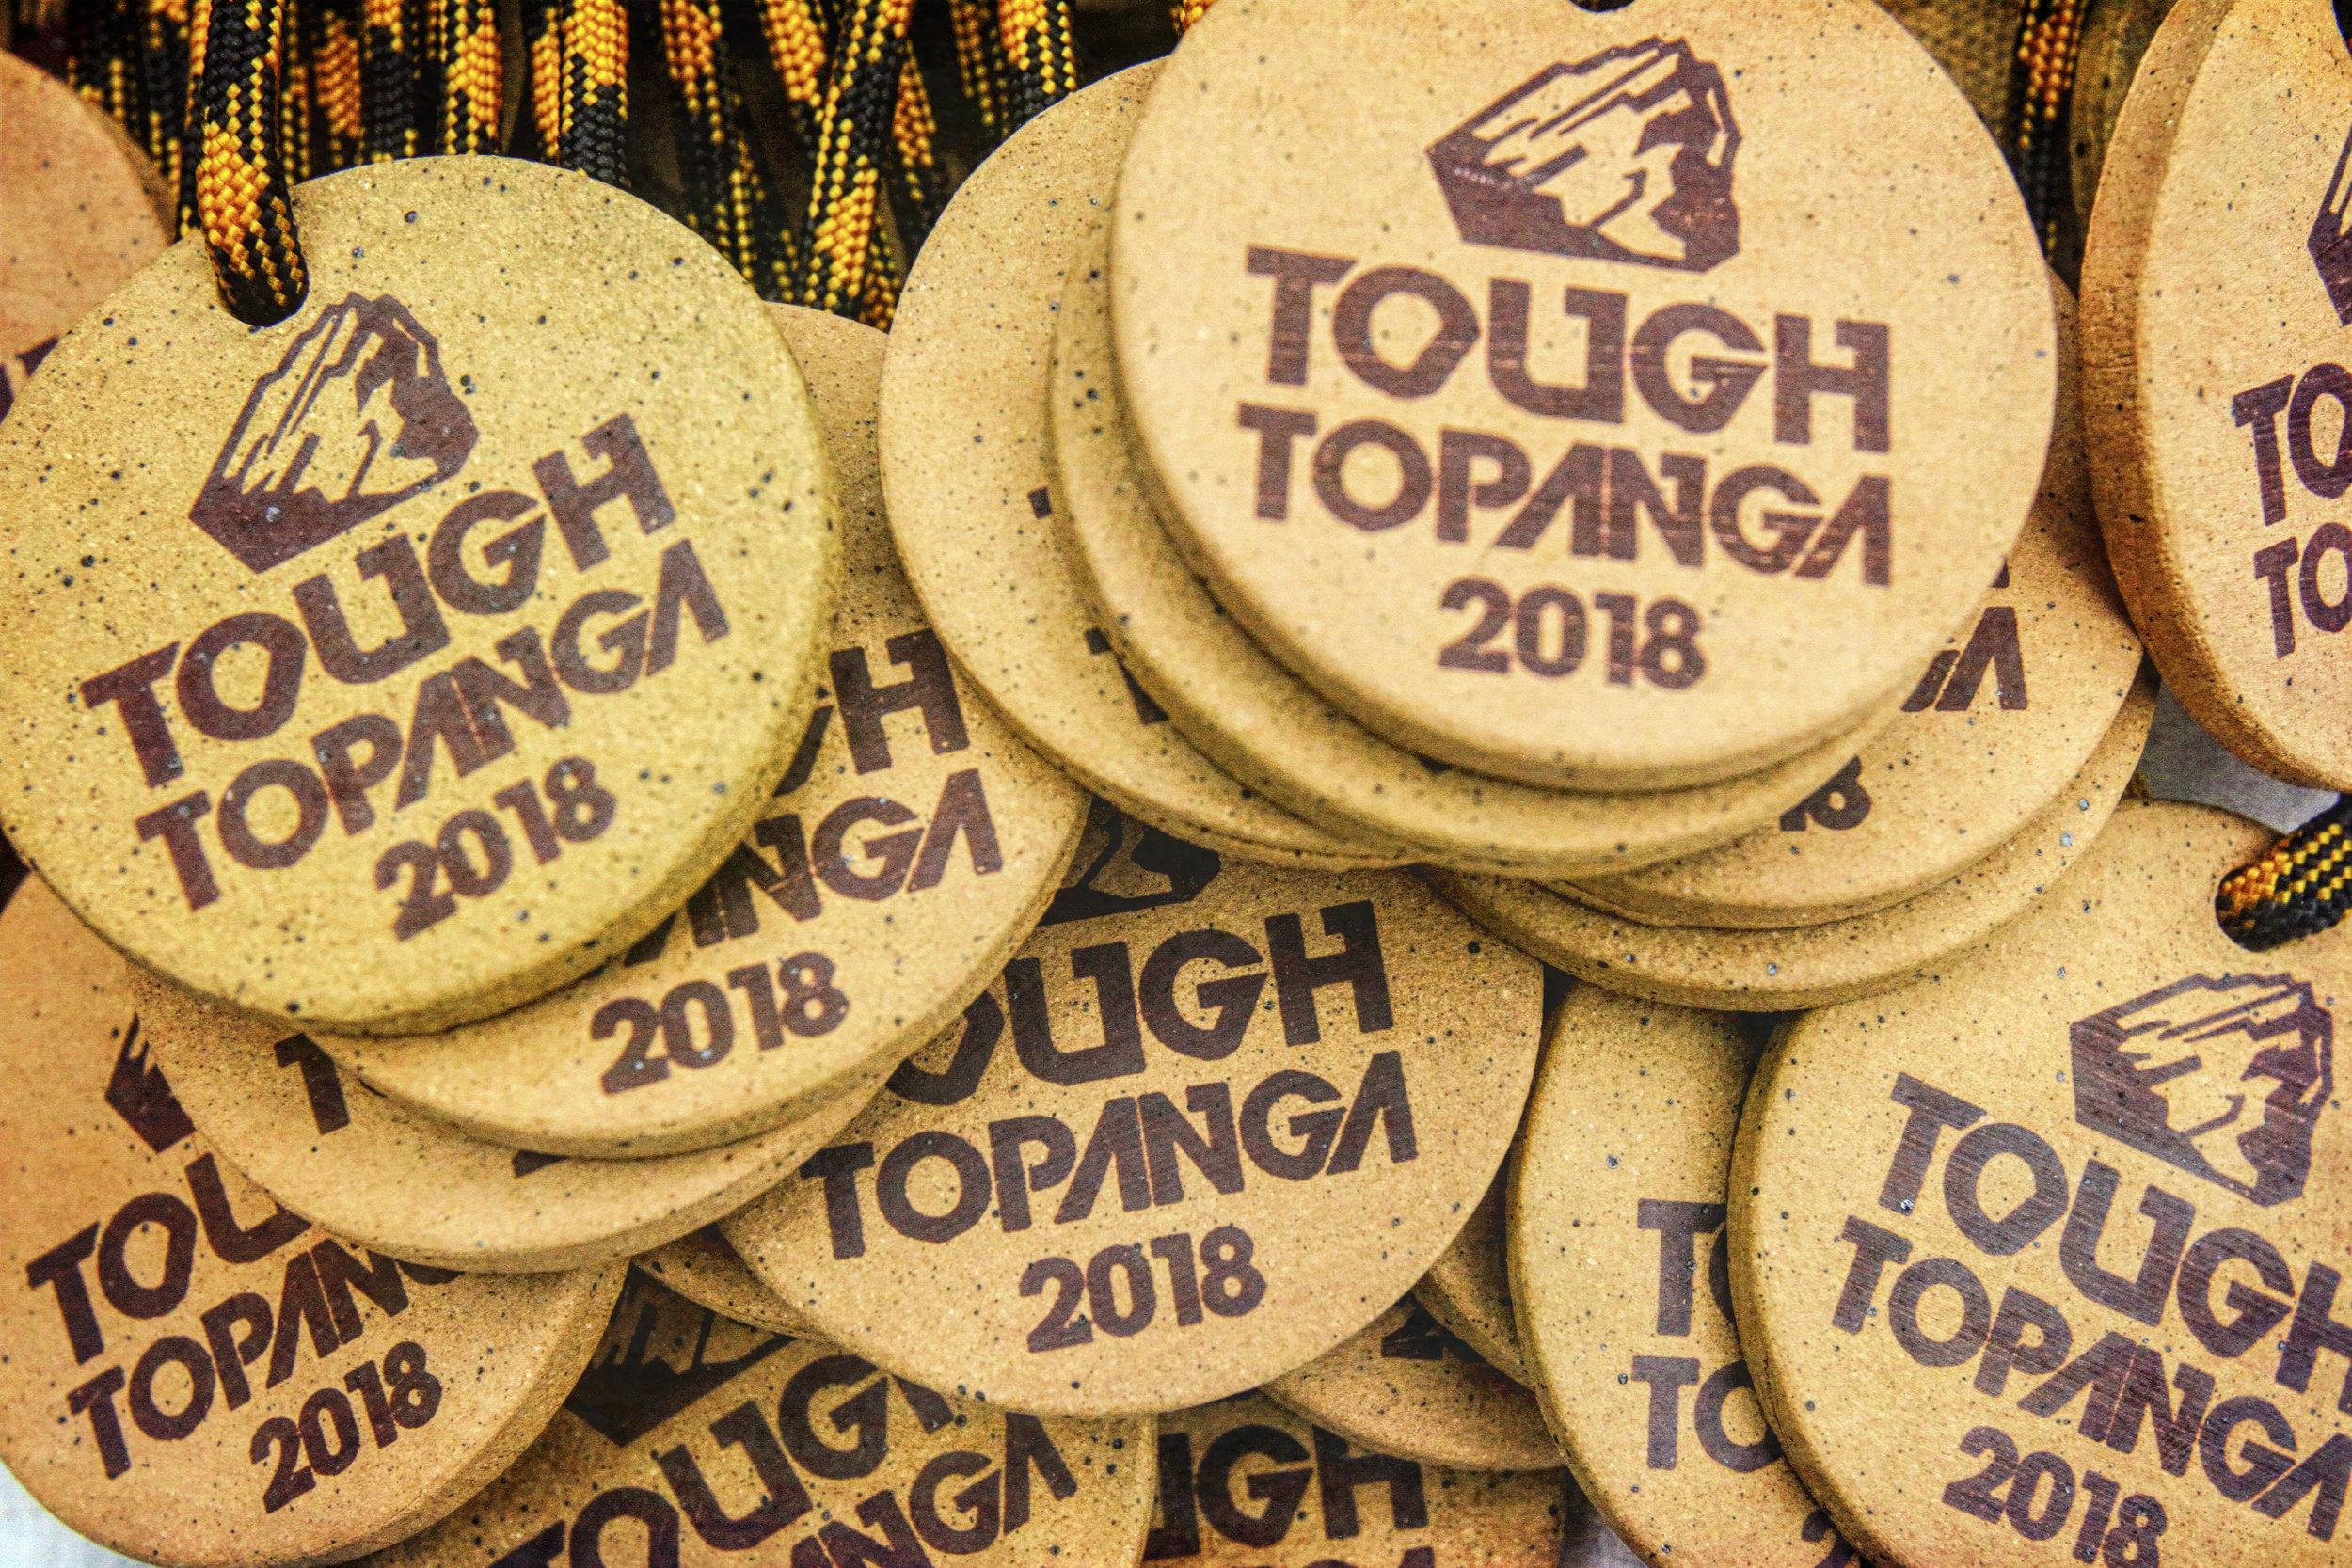 2018_toughTopanga_medals.jpg